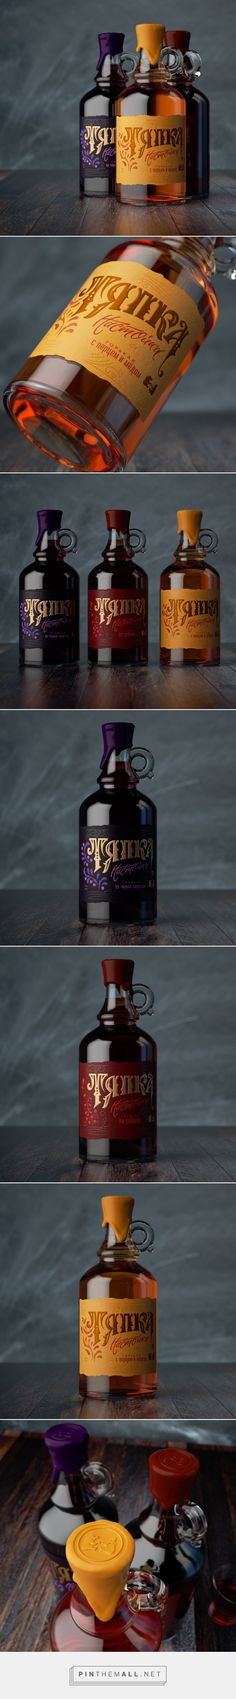 Tyapka liquor packaging design concept by Gizmo Studio - http://www.packagingoftheworld.com/2017/03/tyapka-concept.html